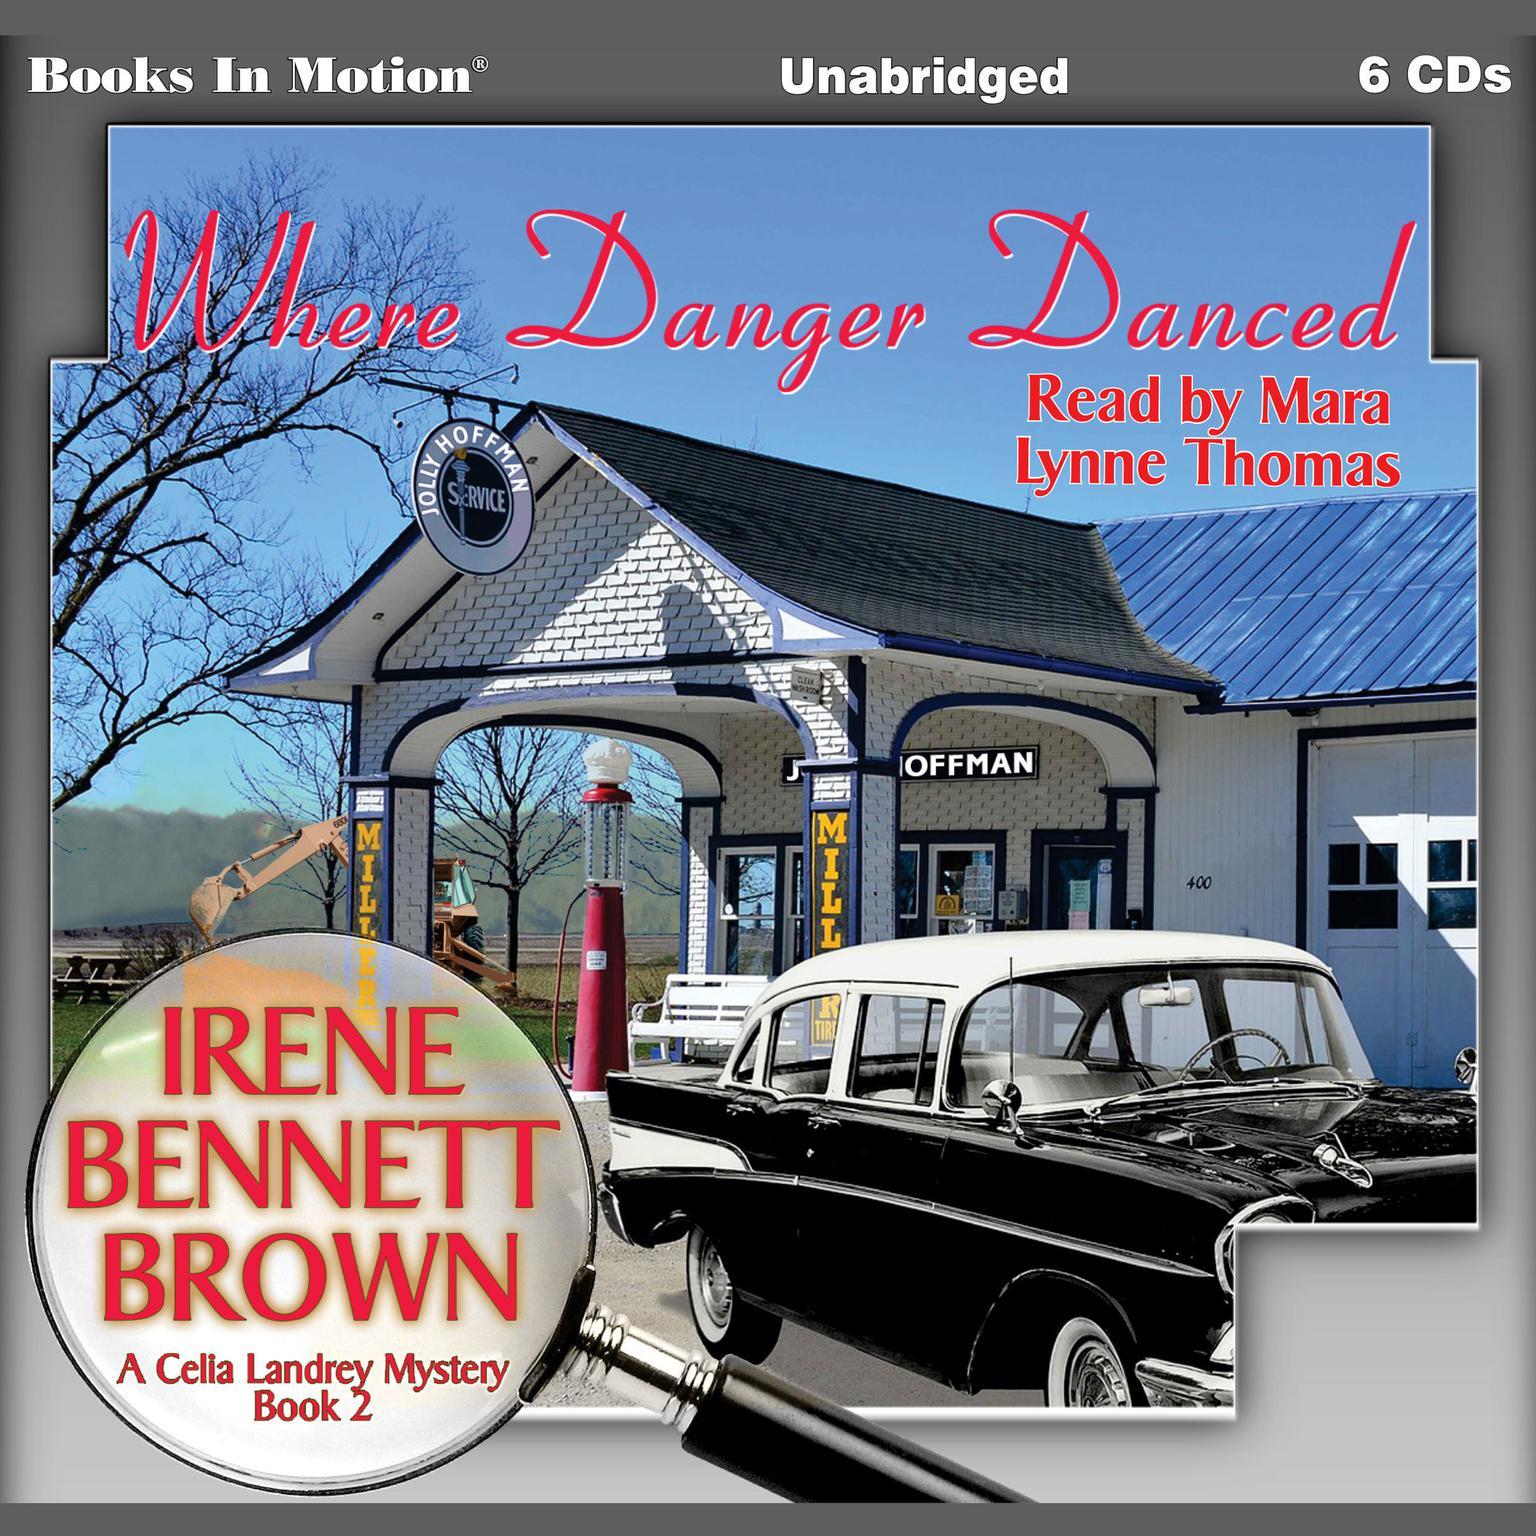 Where Danger Danced (A Celia Landrey Mystery, Book 2) Audiobook, by Irene Bennett Brown